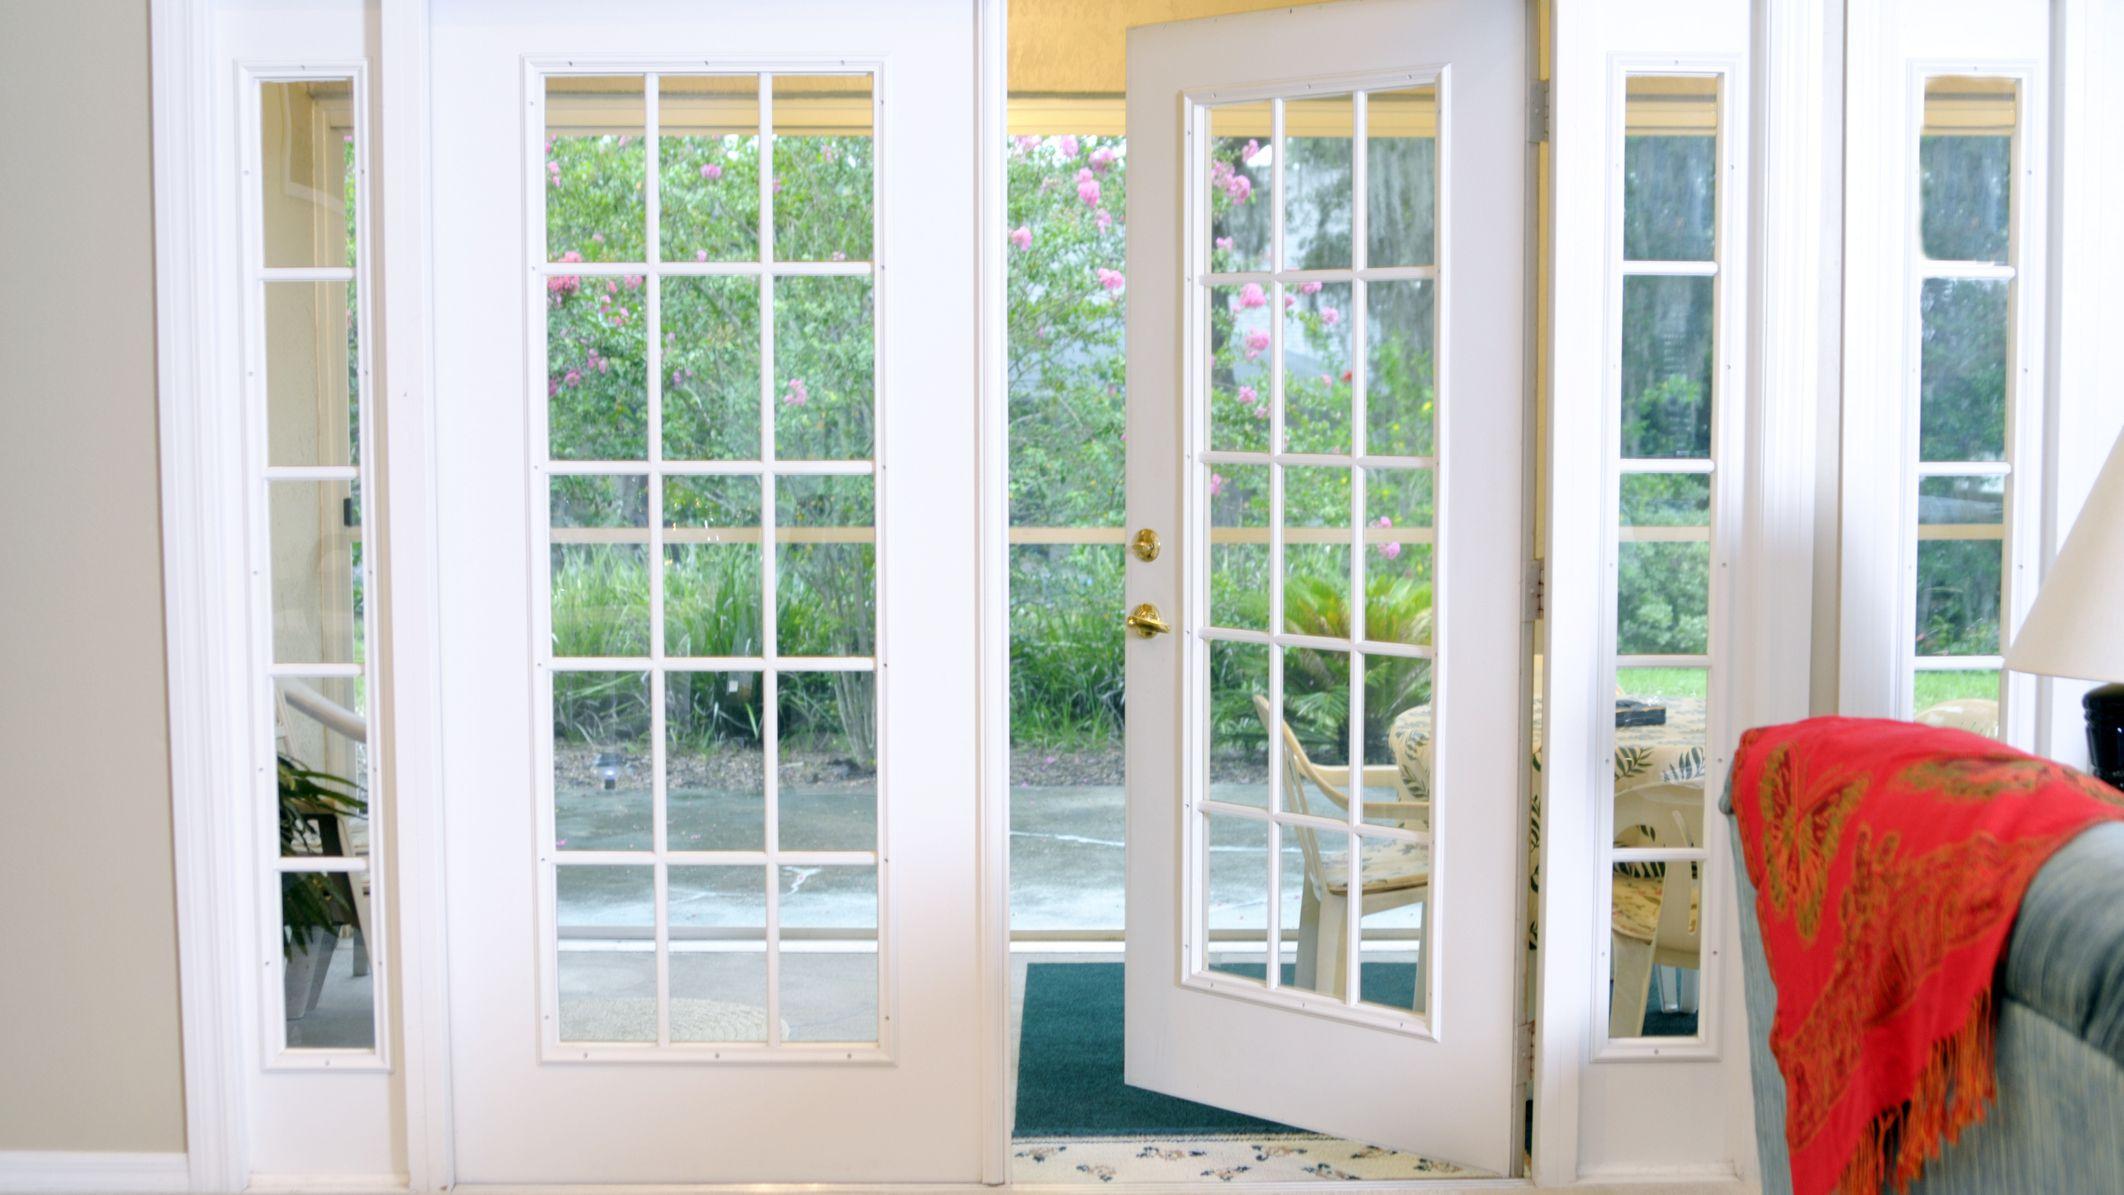 Types Of Doors Used In Homes